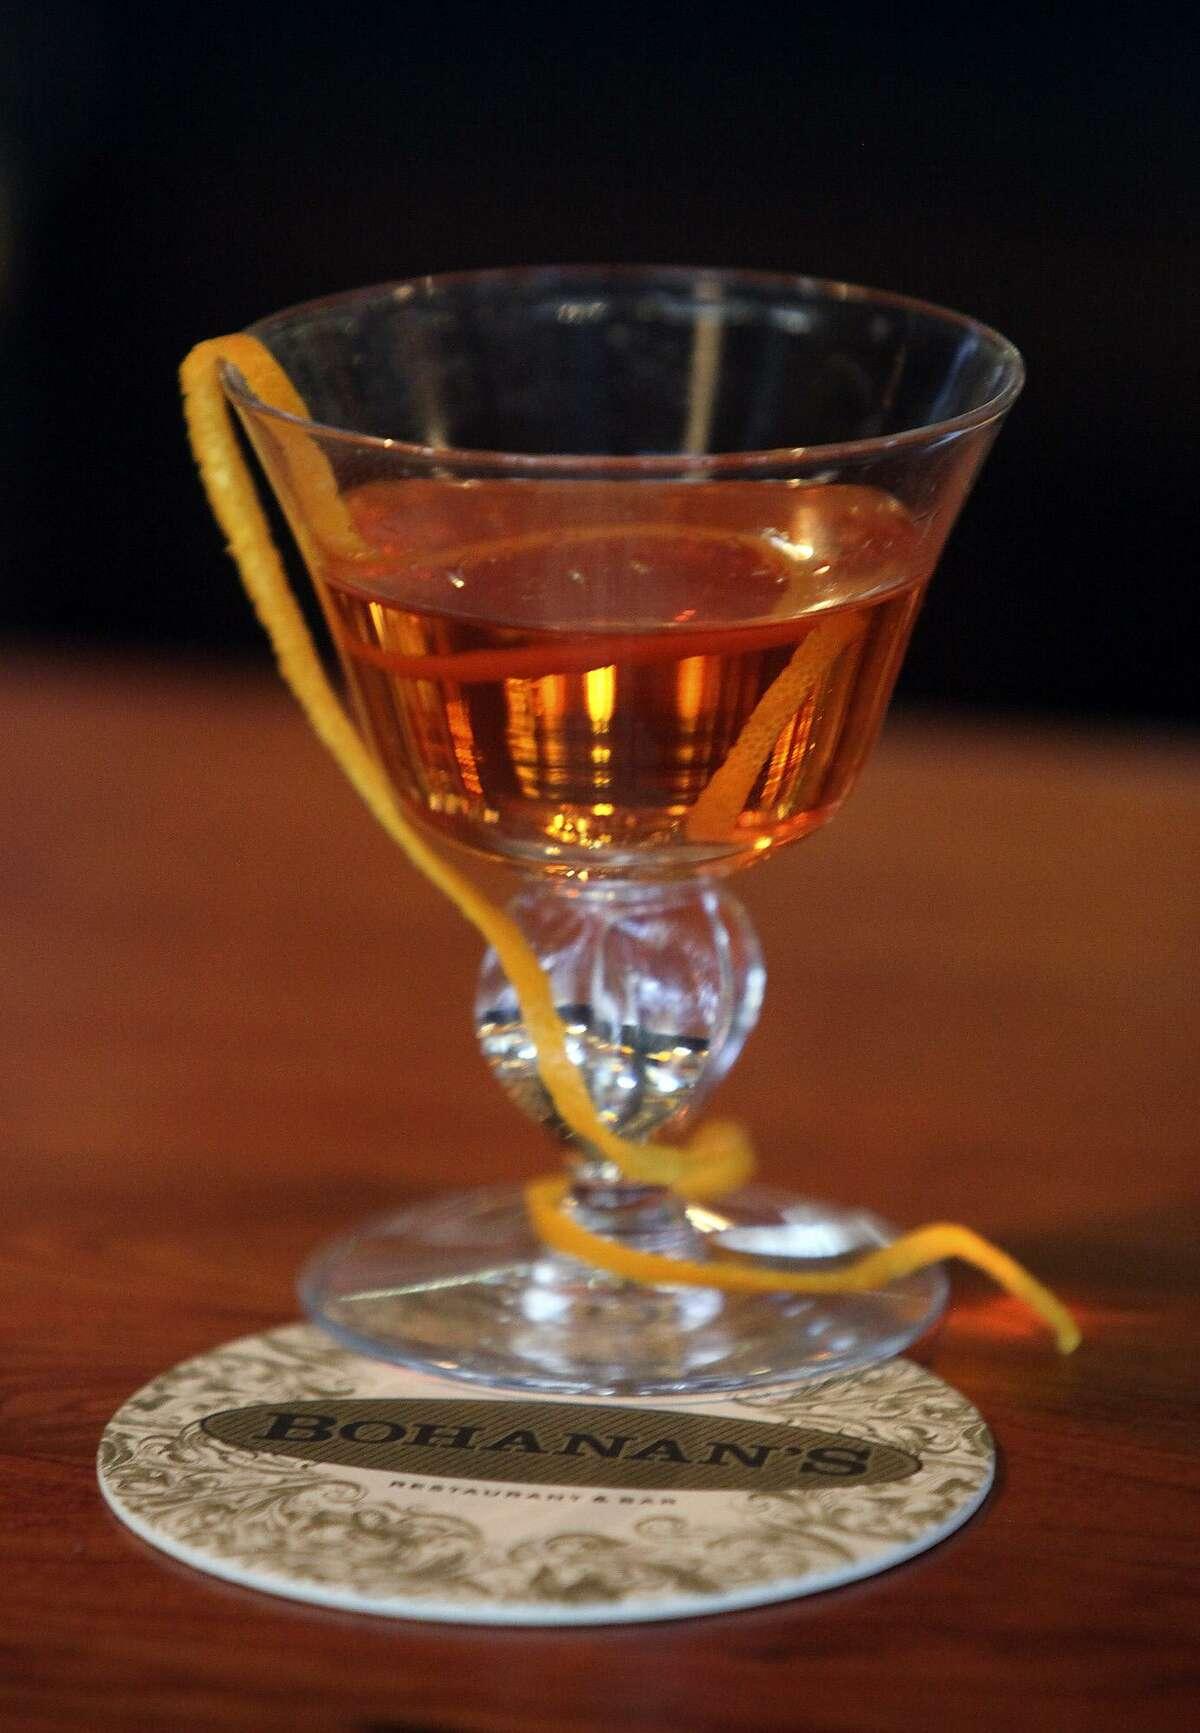 The beverage sazerac is served at Bohanan's on February 25, 2010. Tom Reel/Staff